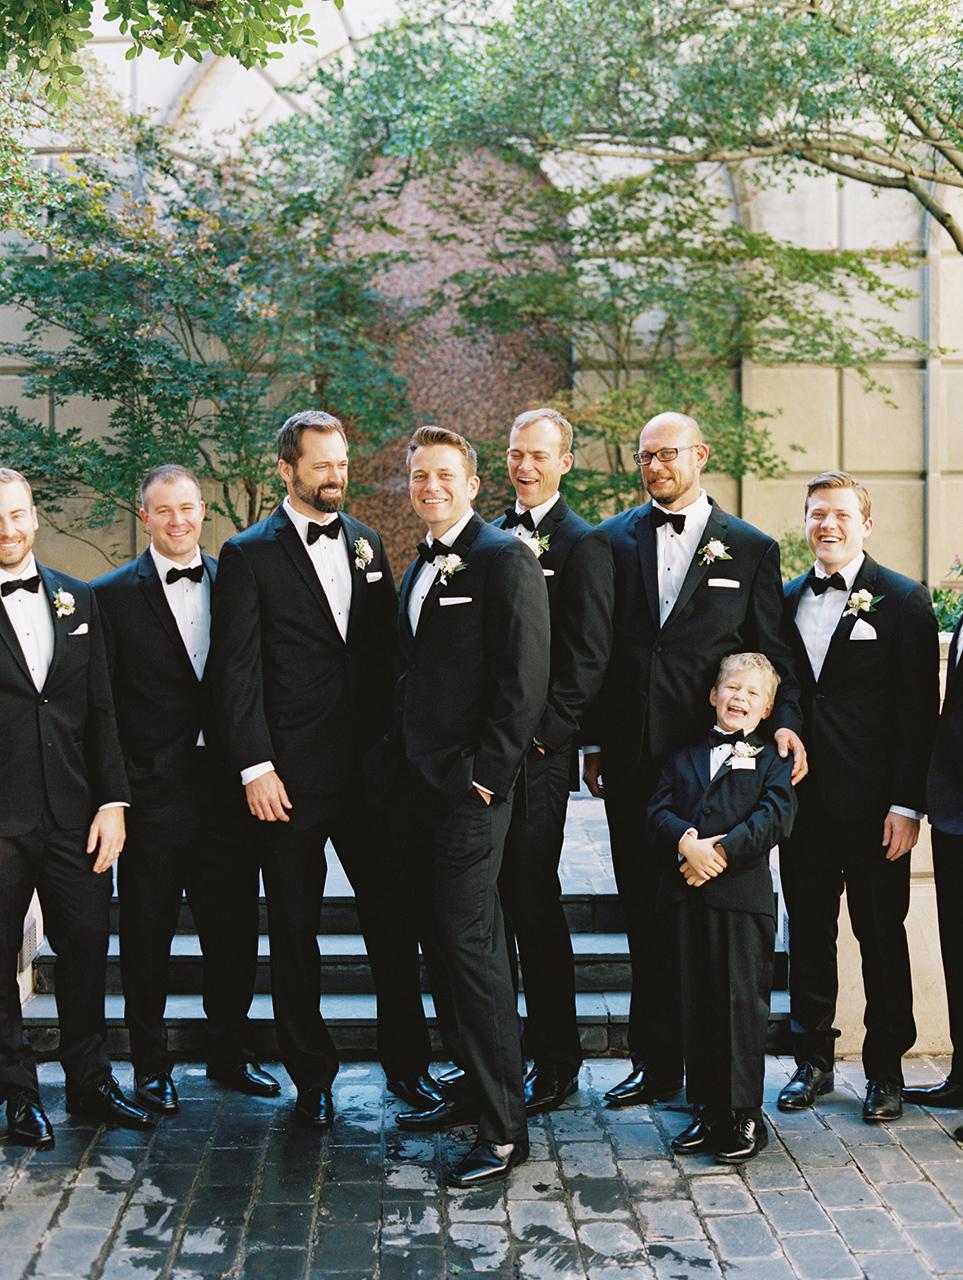 wedding groomsmen classic black tuxedos